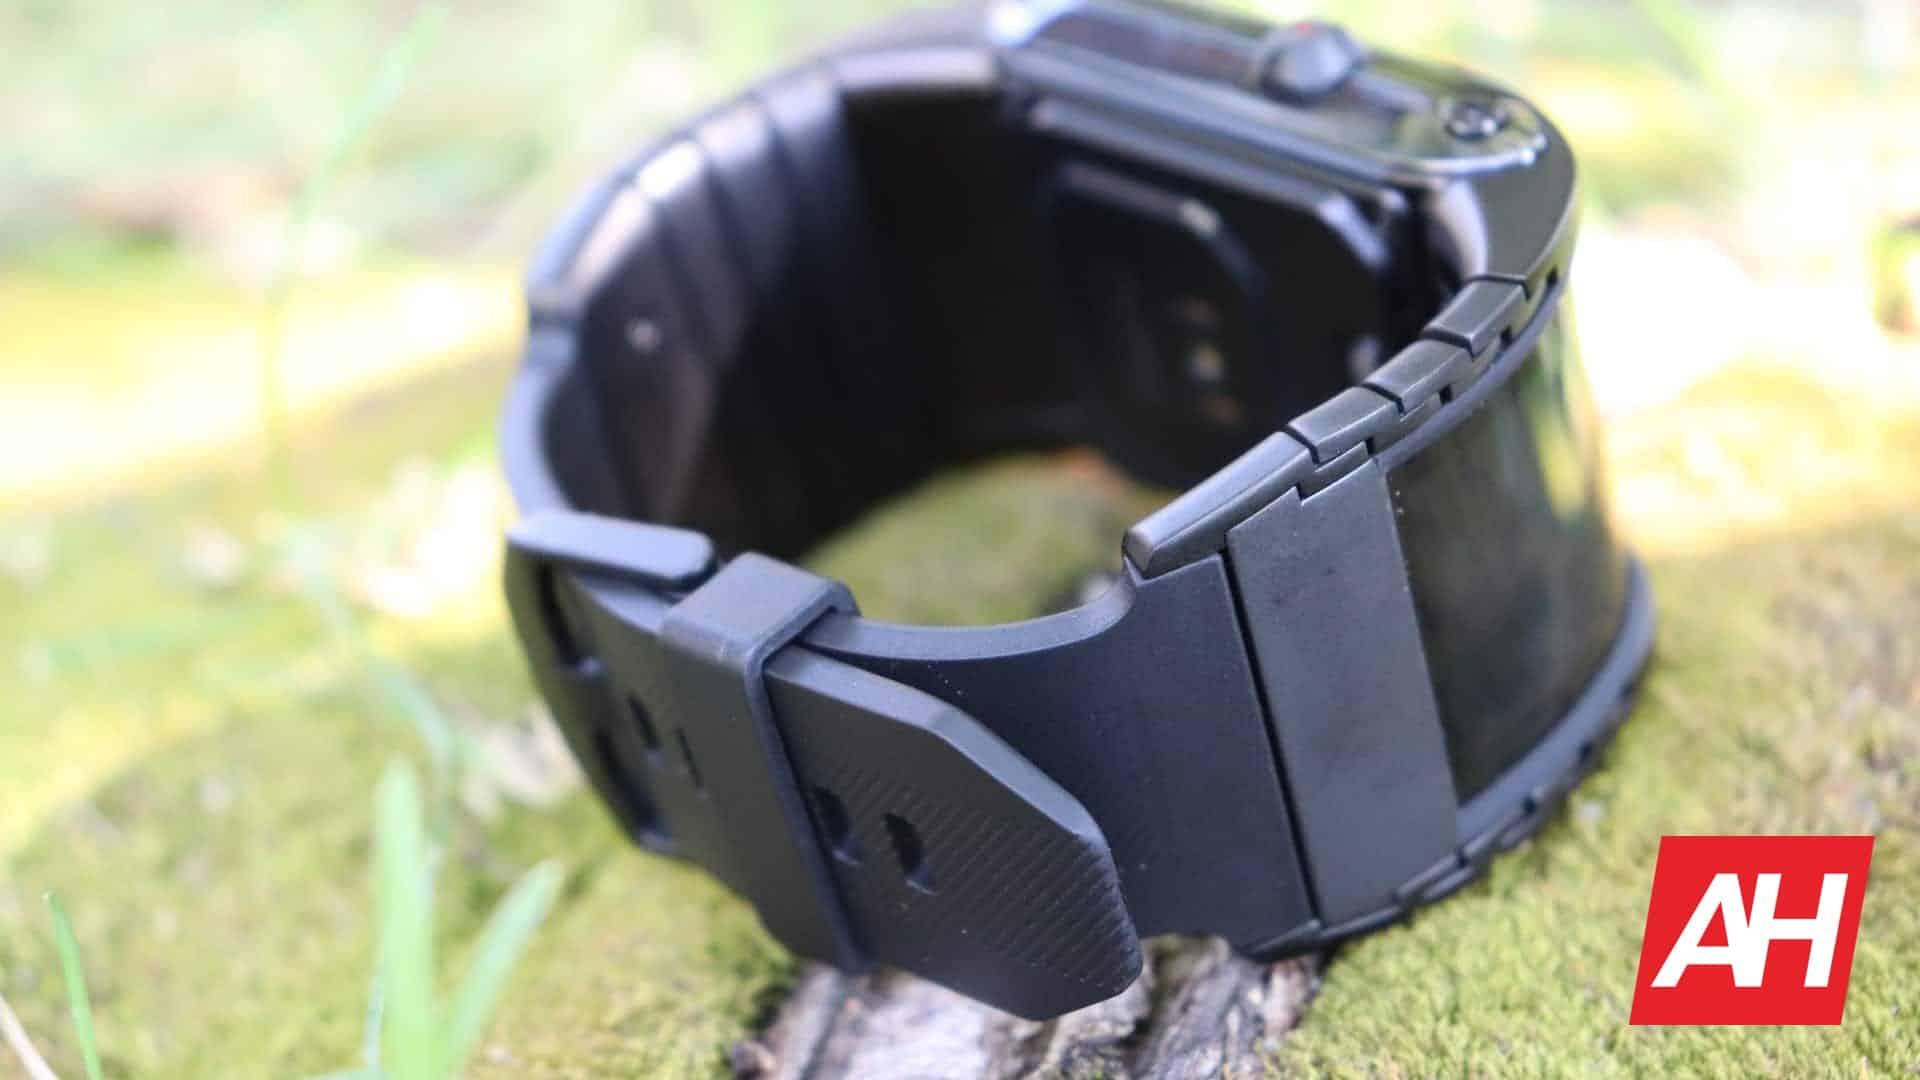 01 6 Nubia Watch Review Hardware DG AH 2020